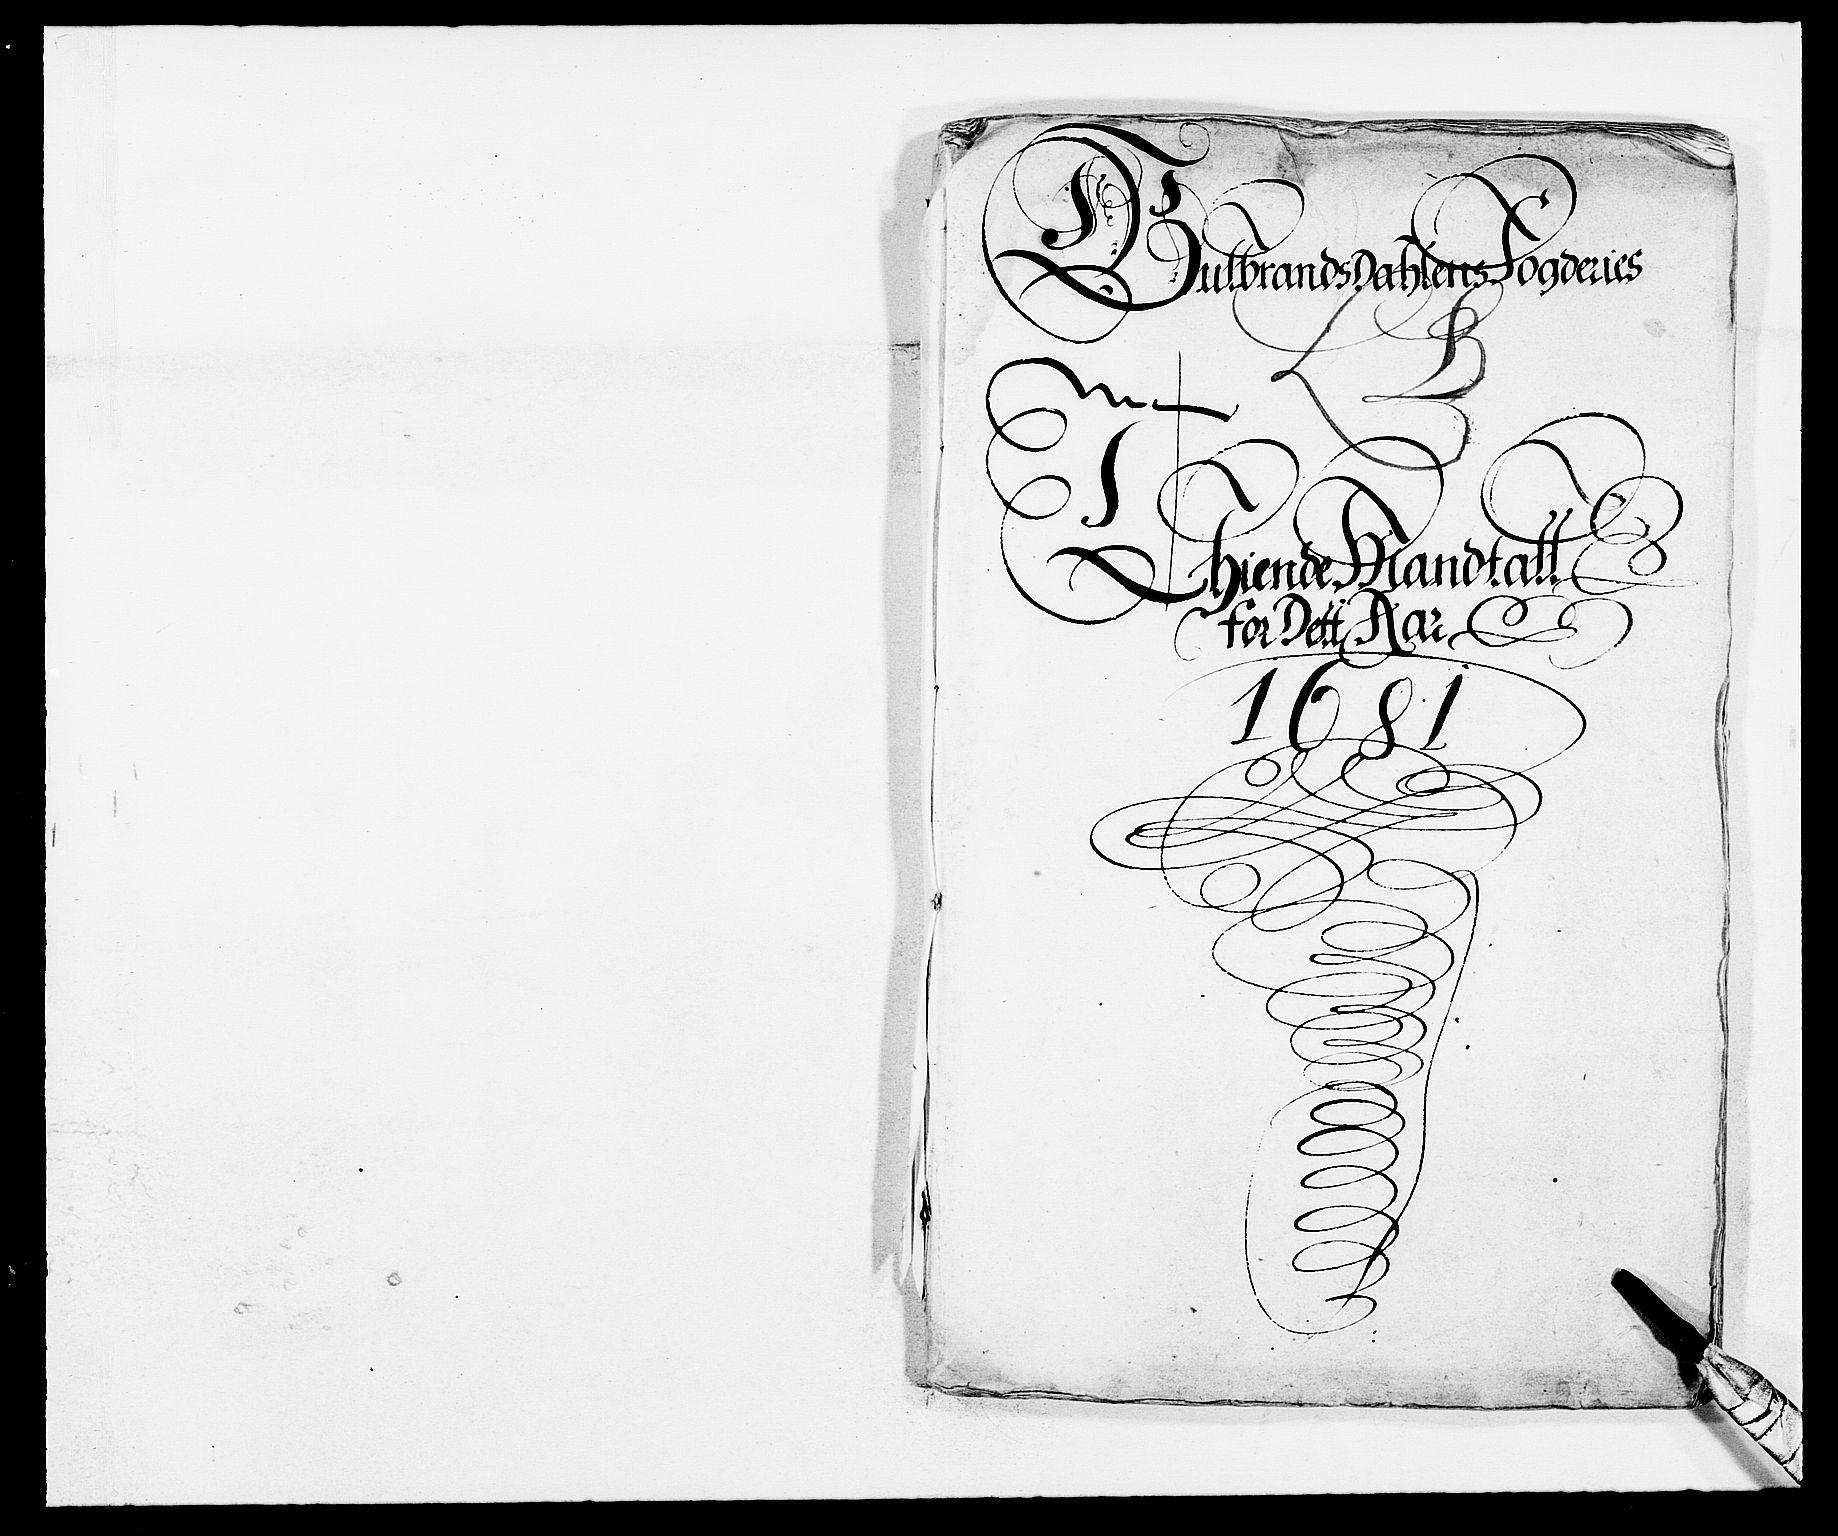 RA, Rentekammeret inntil 1814, Reviderte regnskaper, Fogderegnskap, R17/L1155: Fogderegnskap Gudbrandsdal, 1681, s. 176